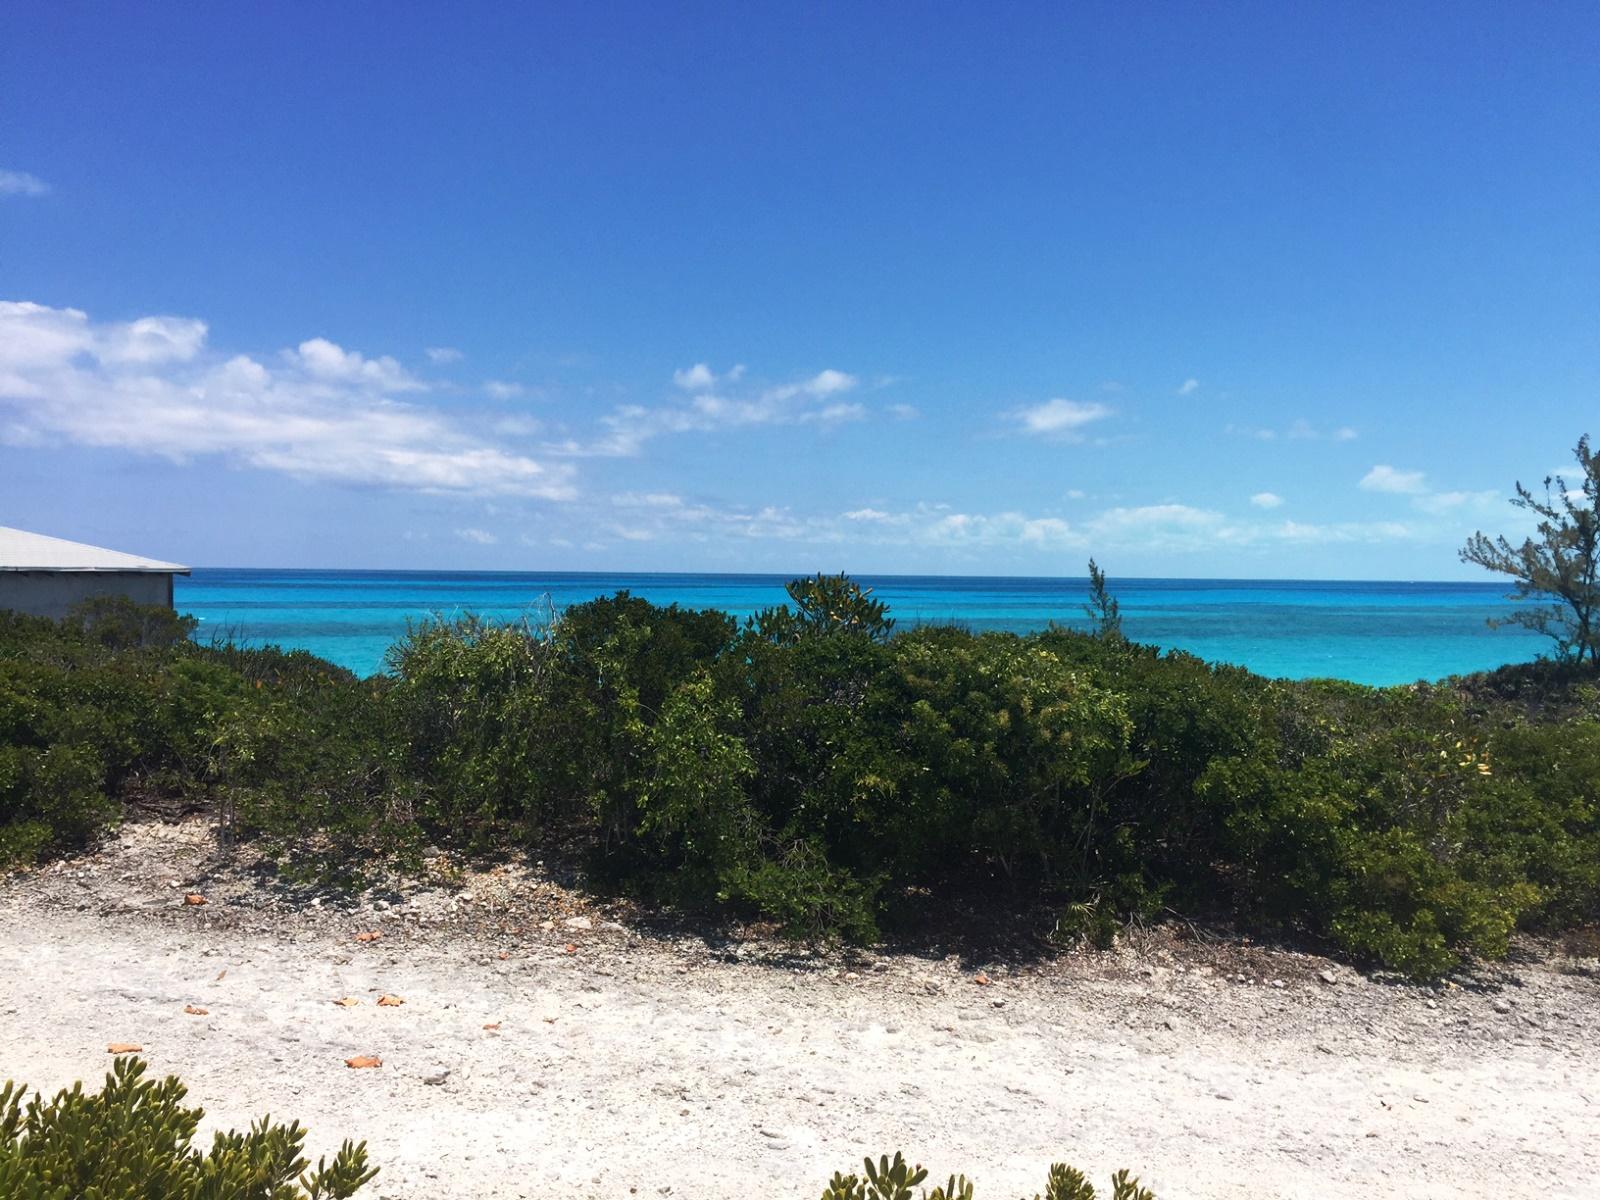 Land for Sale at Vacant Building Lot on Little Exuma with Ocean Views Bahama Island Beach, Exuma, Bahamas